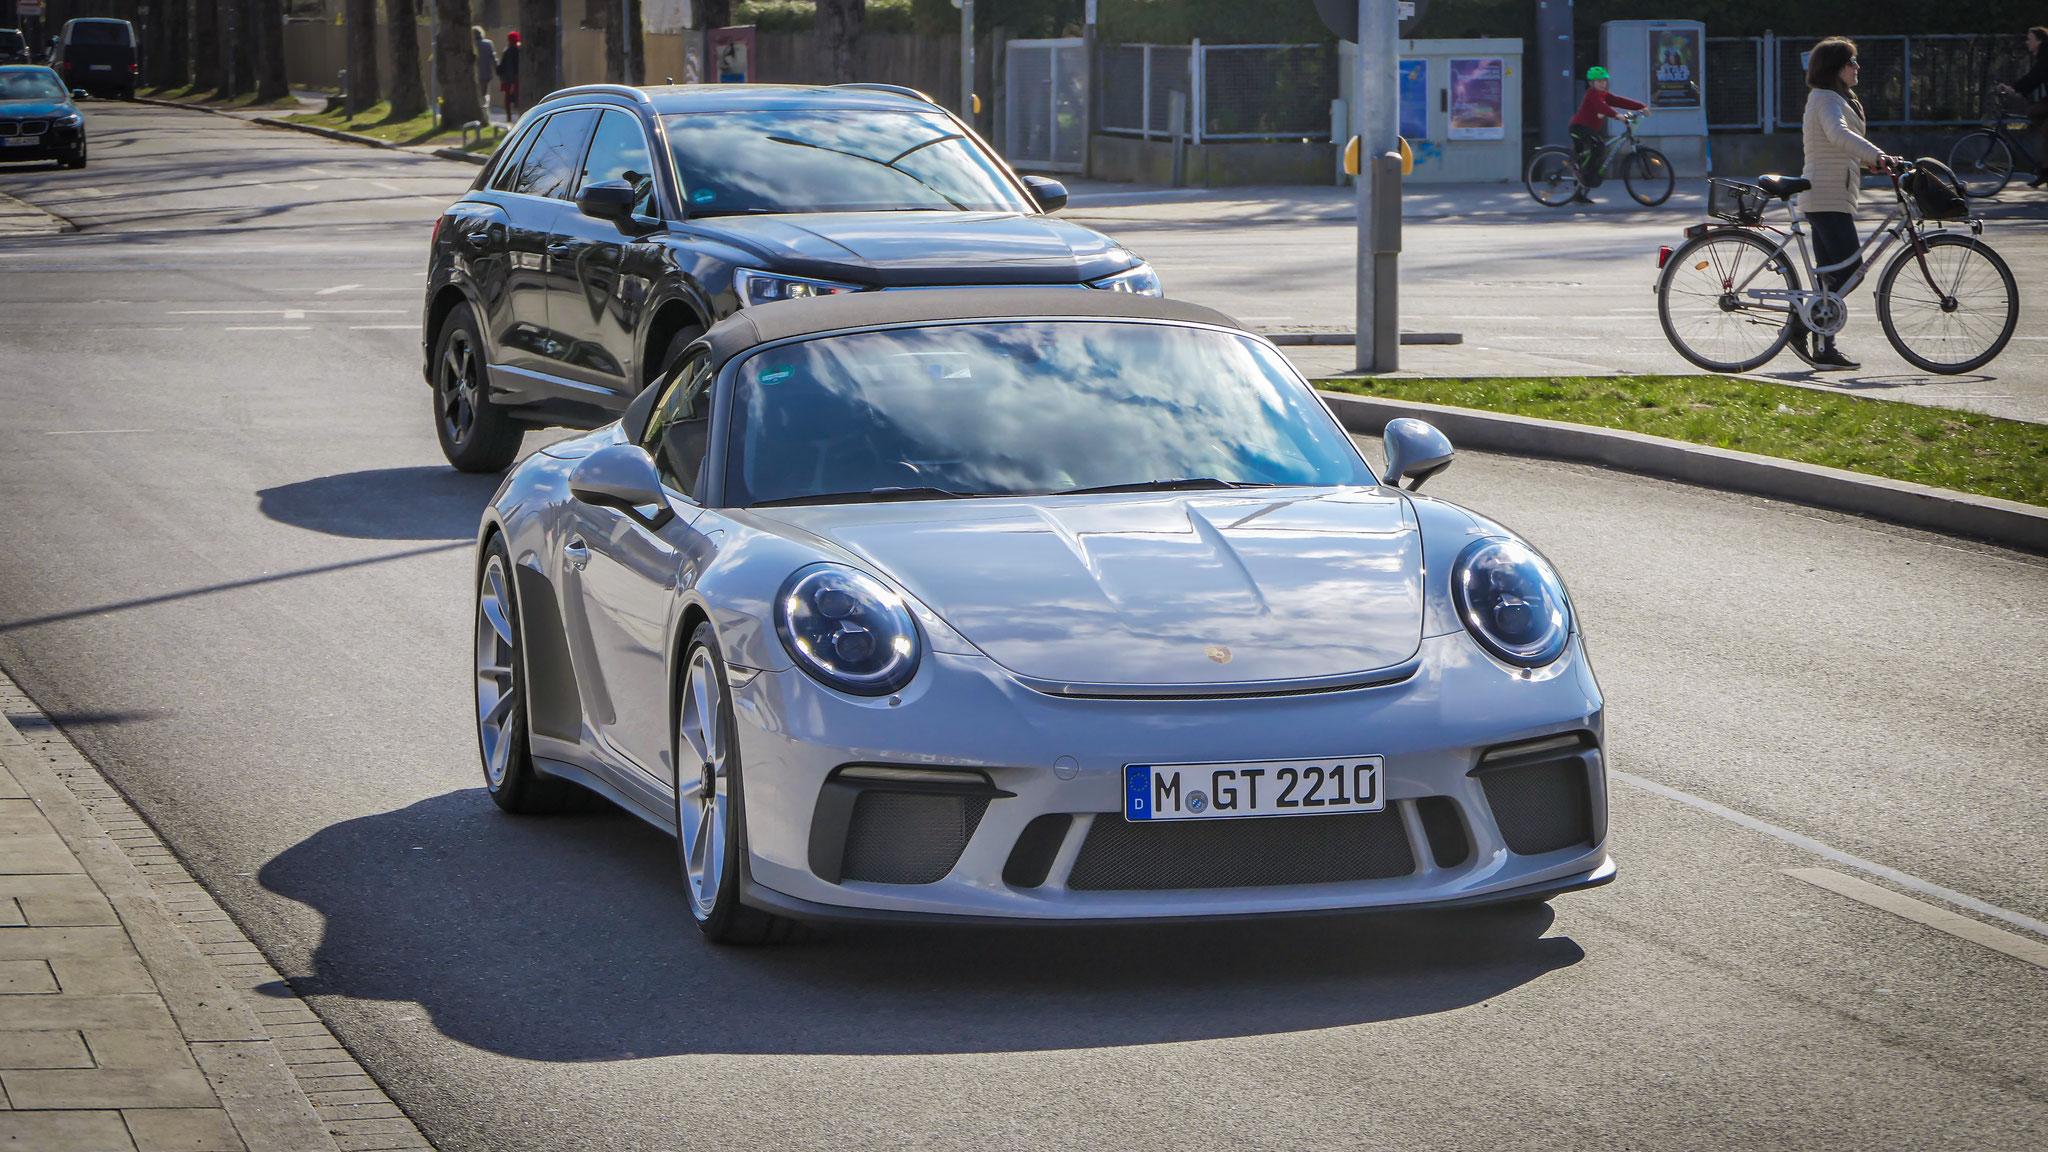 Porsche 991 Speedster - M-GT-2210